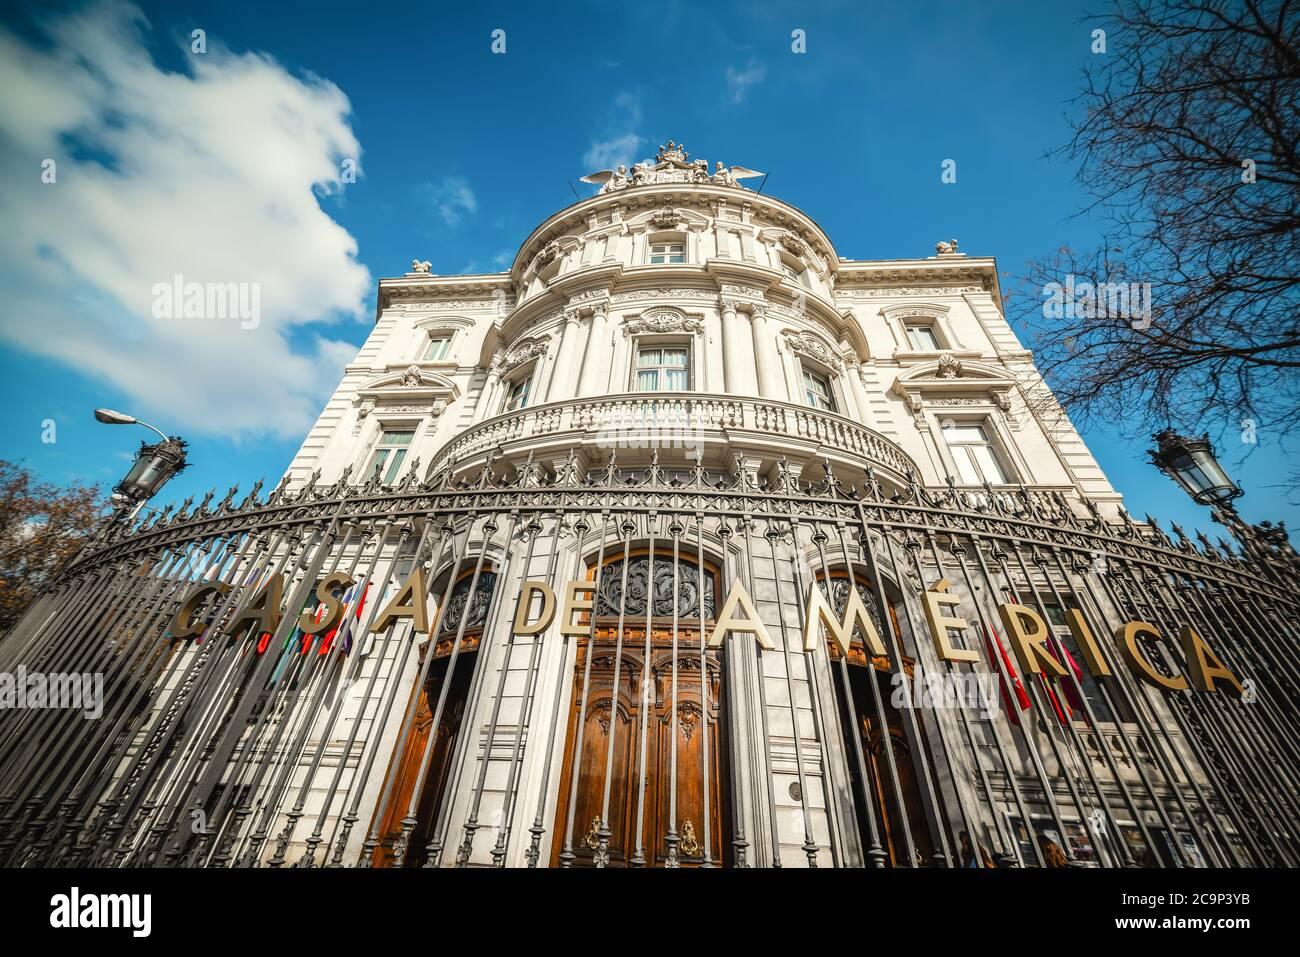 Casa de America building in Plaza de Cibeles under a cloudy sky. Madrid, Spain Stock Photo